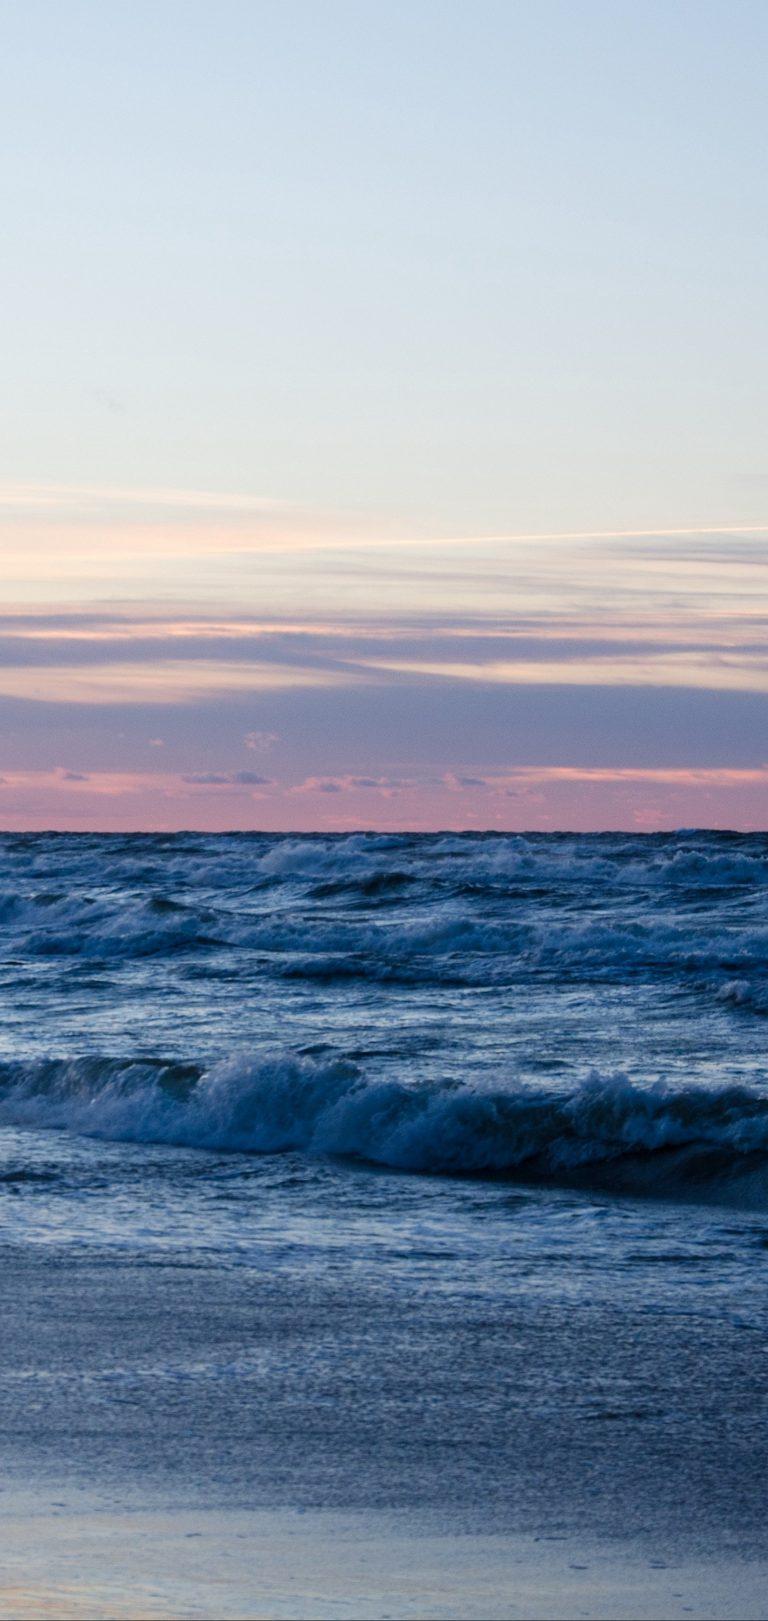 Beach Ocean Sand Horizon Wallpaper 1440x3040 768x1621